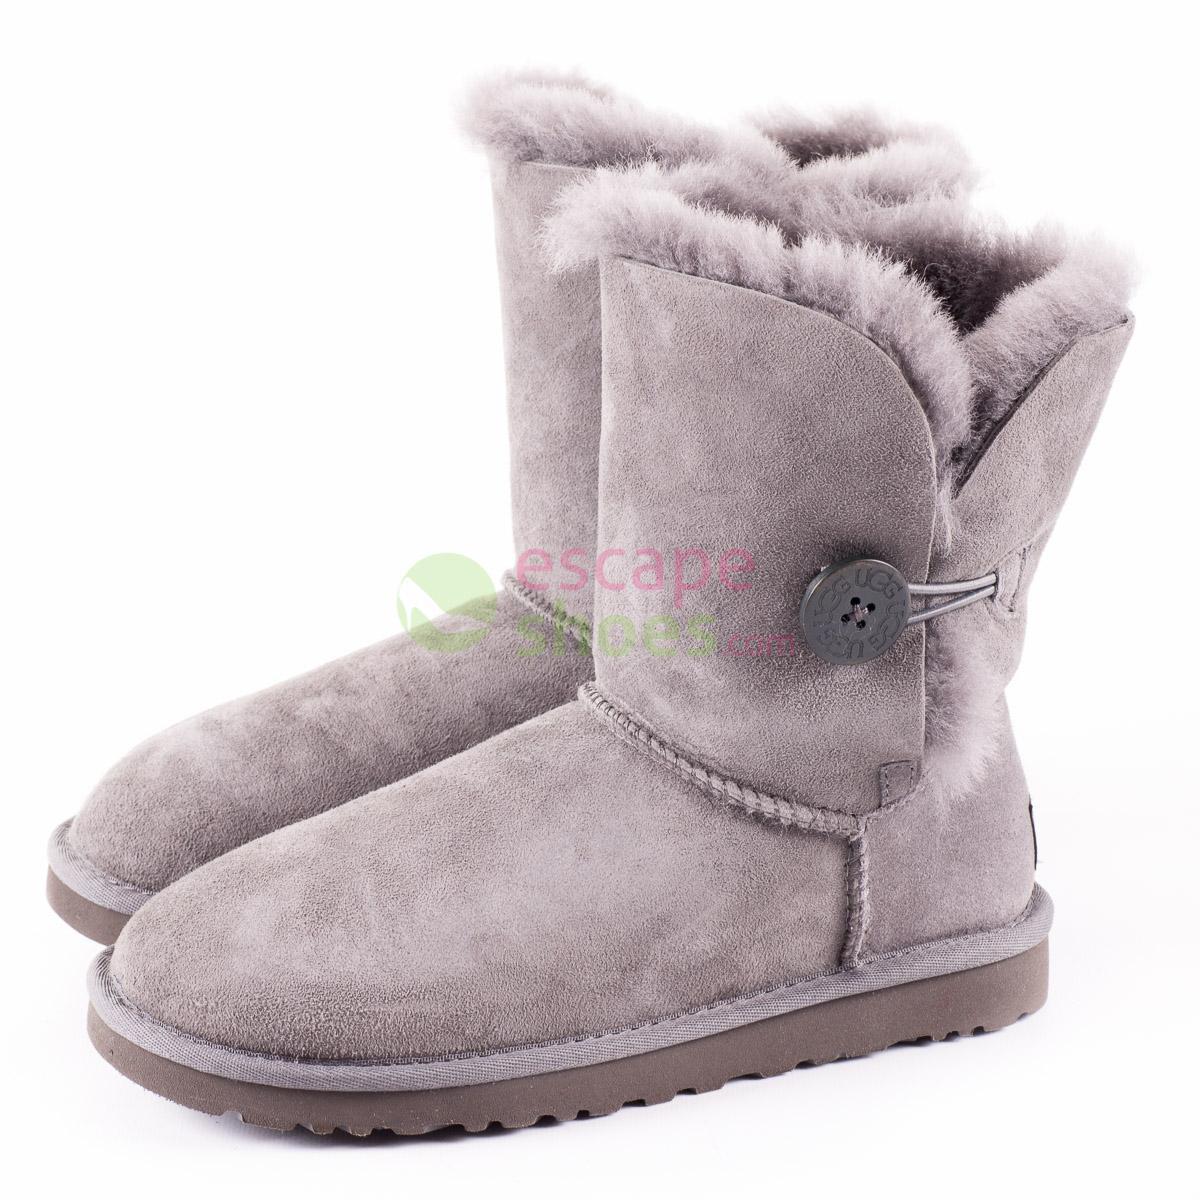 79deb42a48e Buy your Boots UGG Australia Bailey Button Grey 5803 here | Online ...